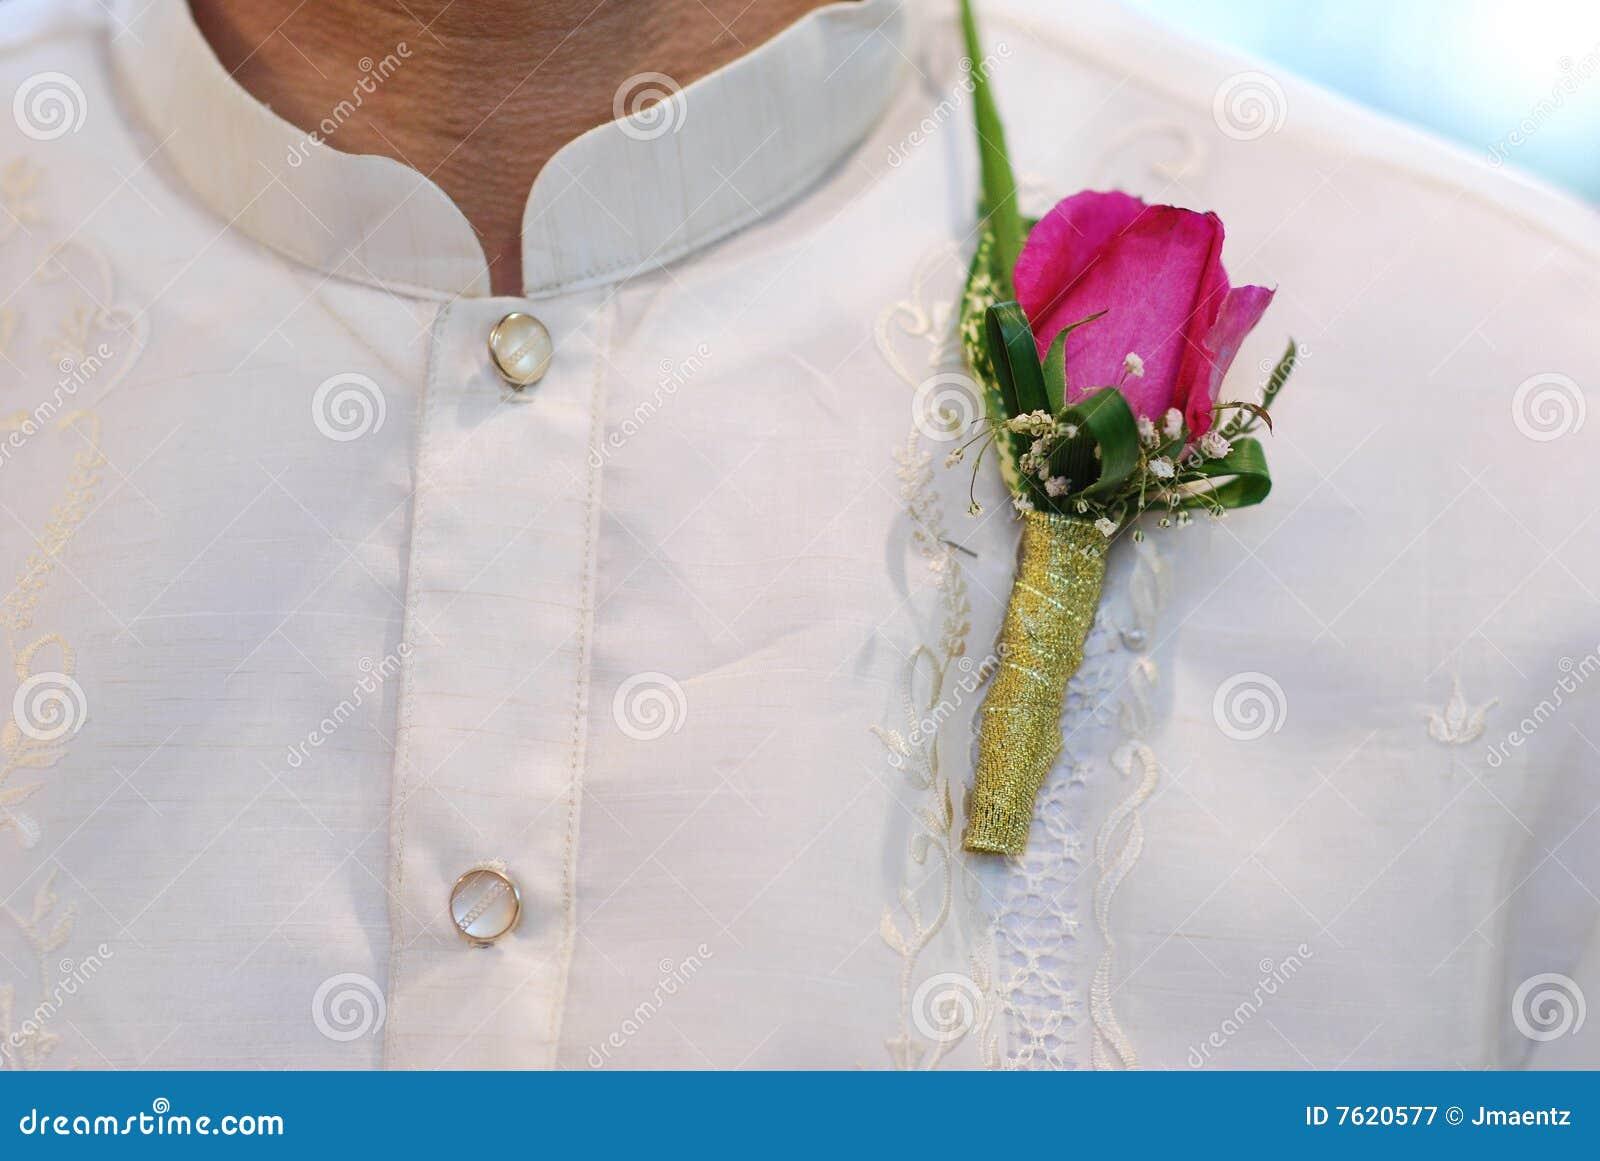 Barong Tagalog mit rosafarbenem Corsage an der Hochzeit